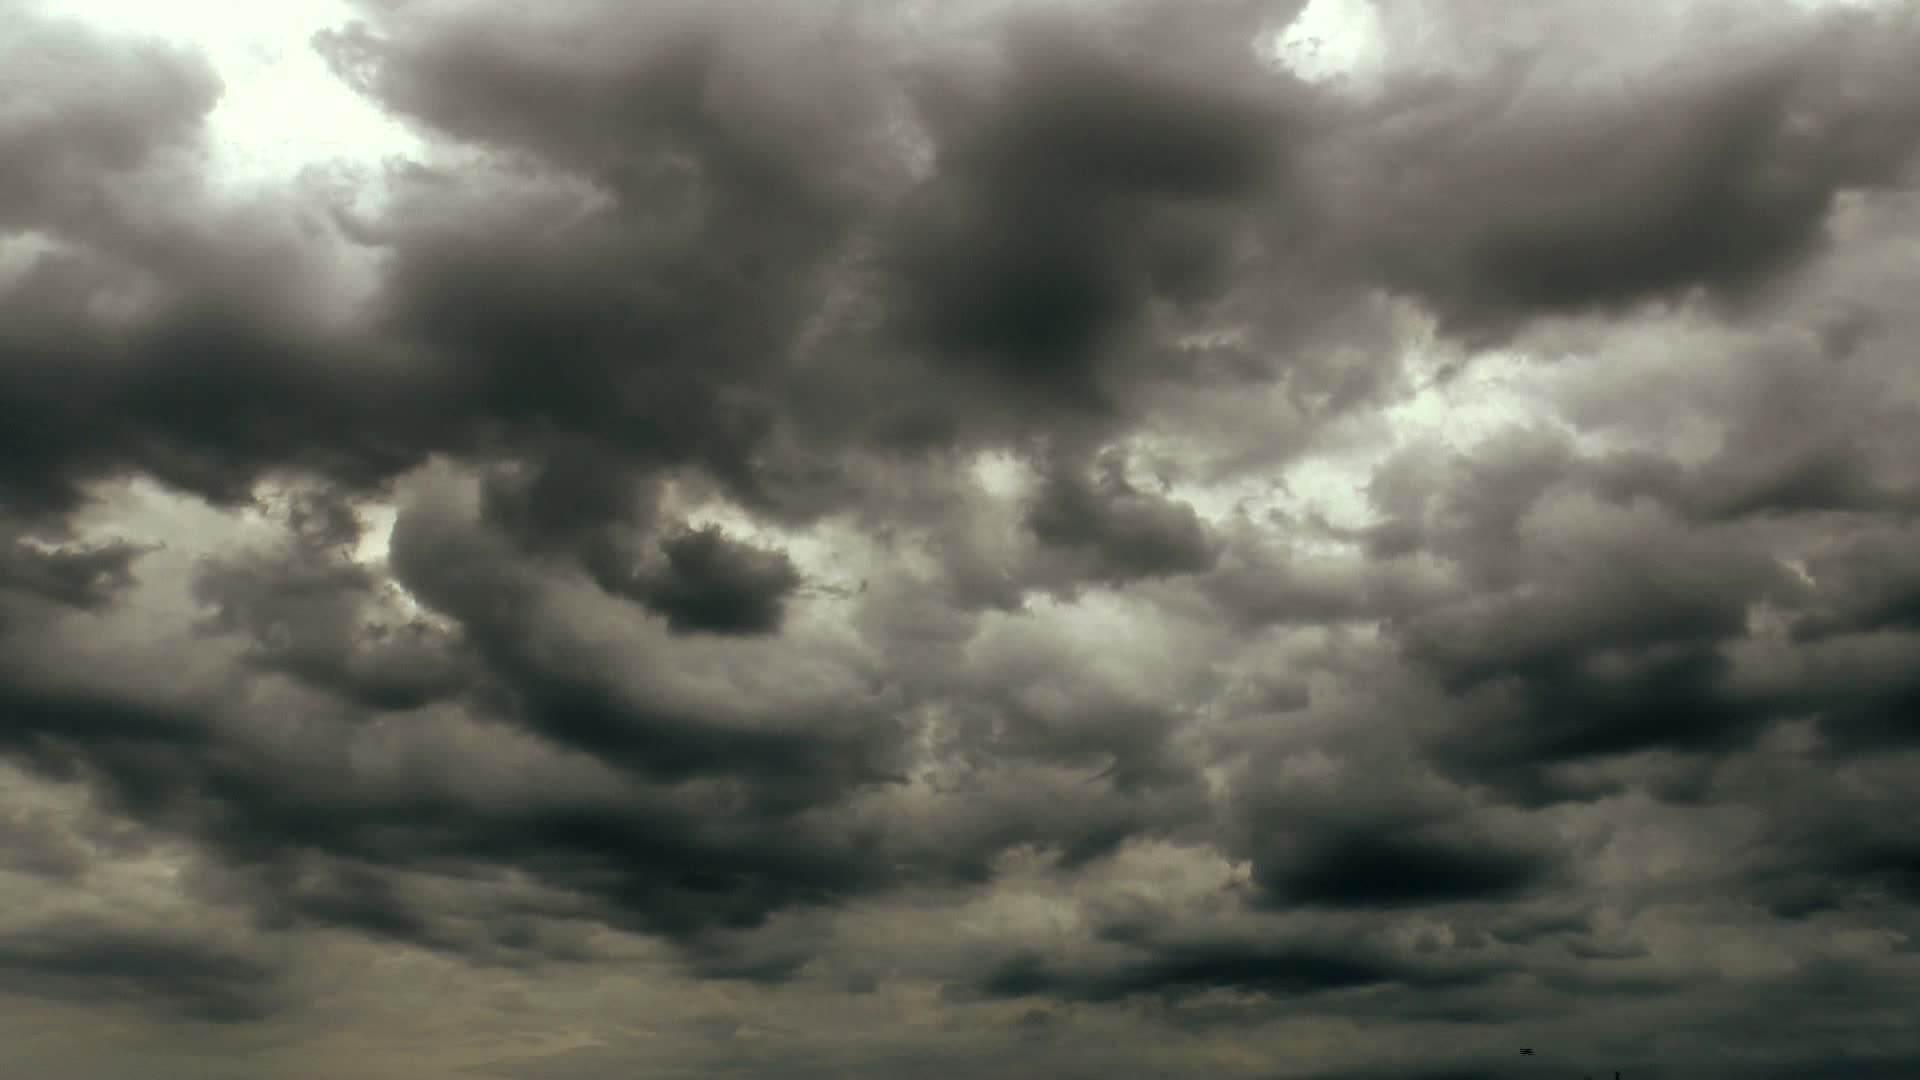 Harris County Windstorm Damage Lawsuit